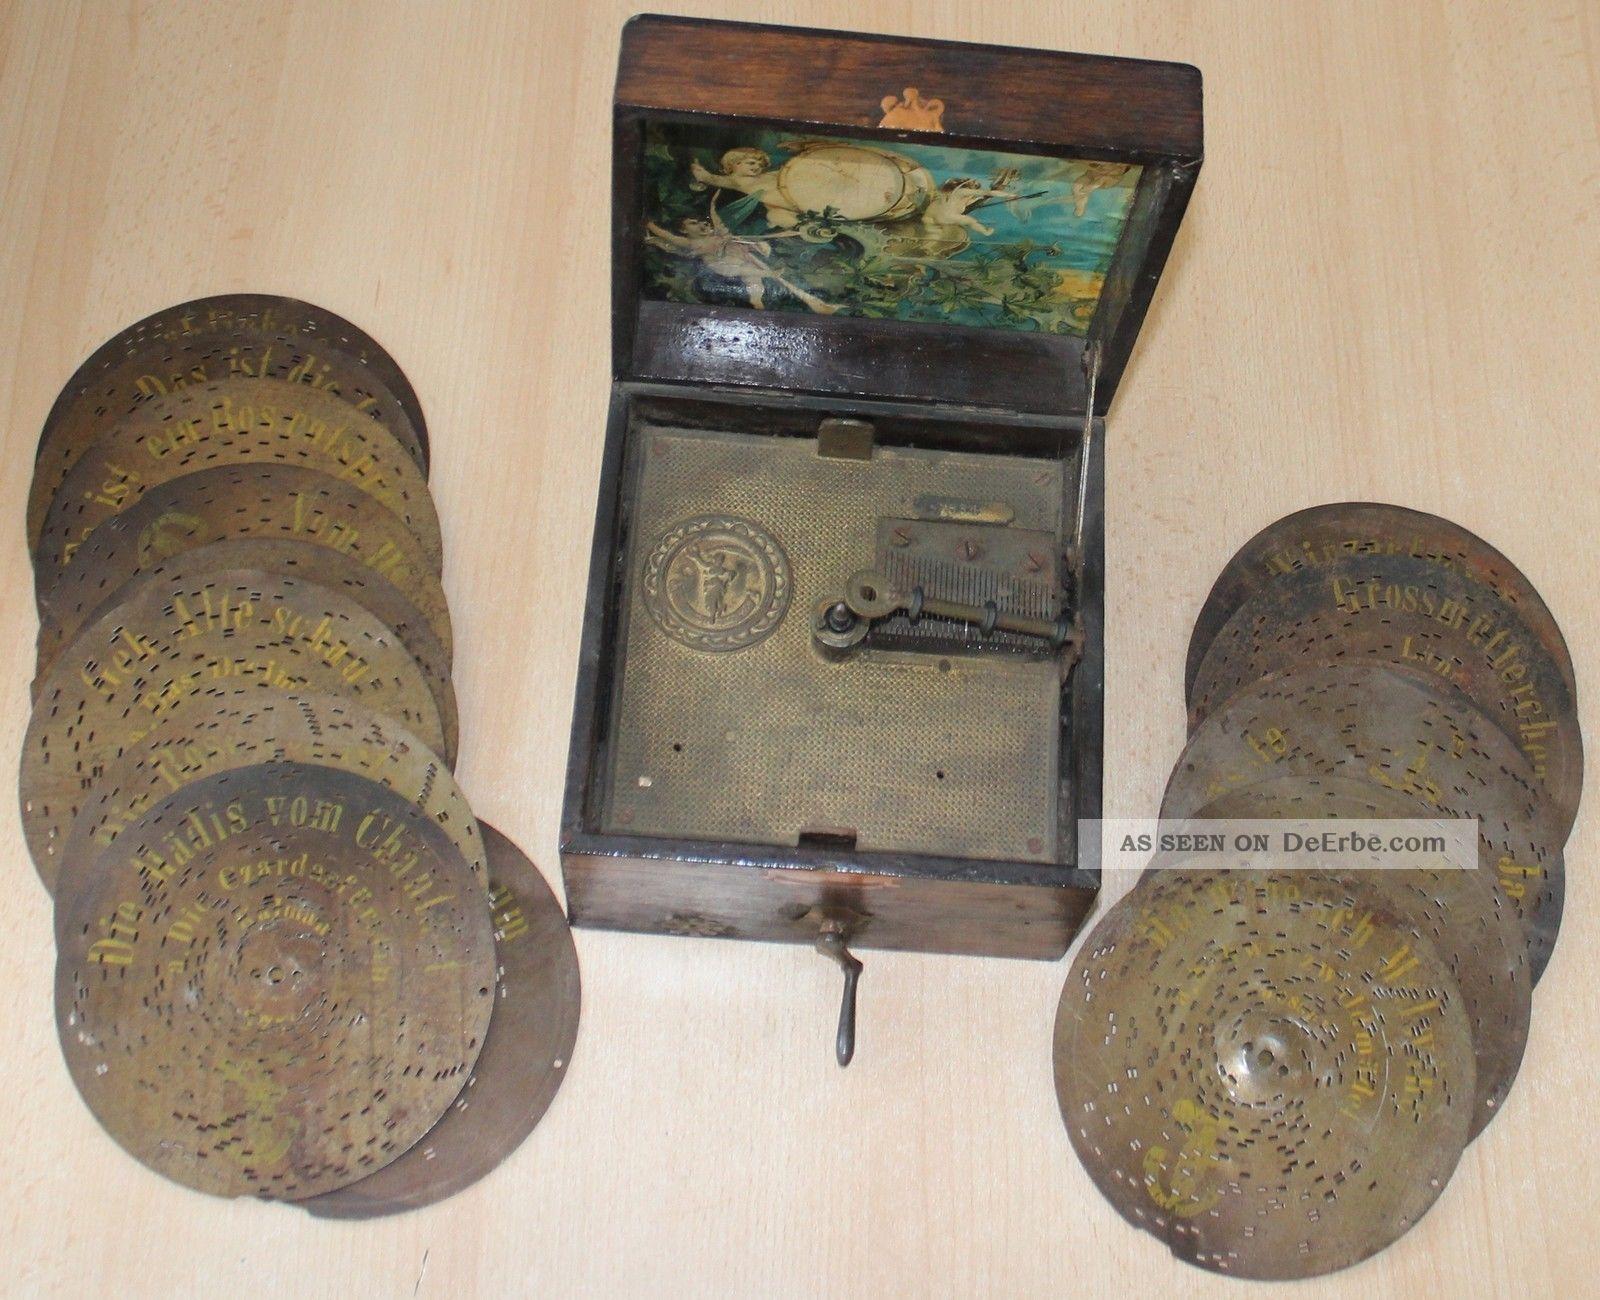 Antike Polyphon Spieluhr,  17 Alte Loch - Blechplatten Lochplatten Mechanische Musik Bild